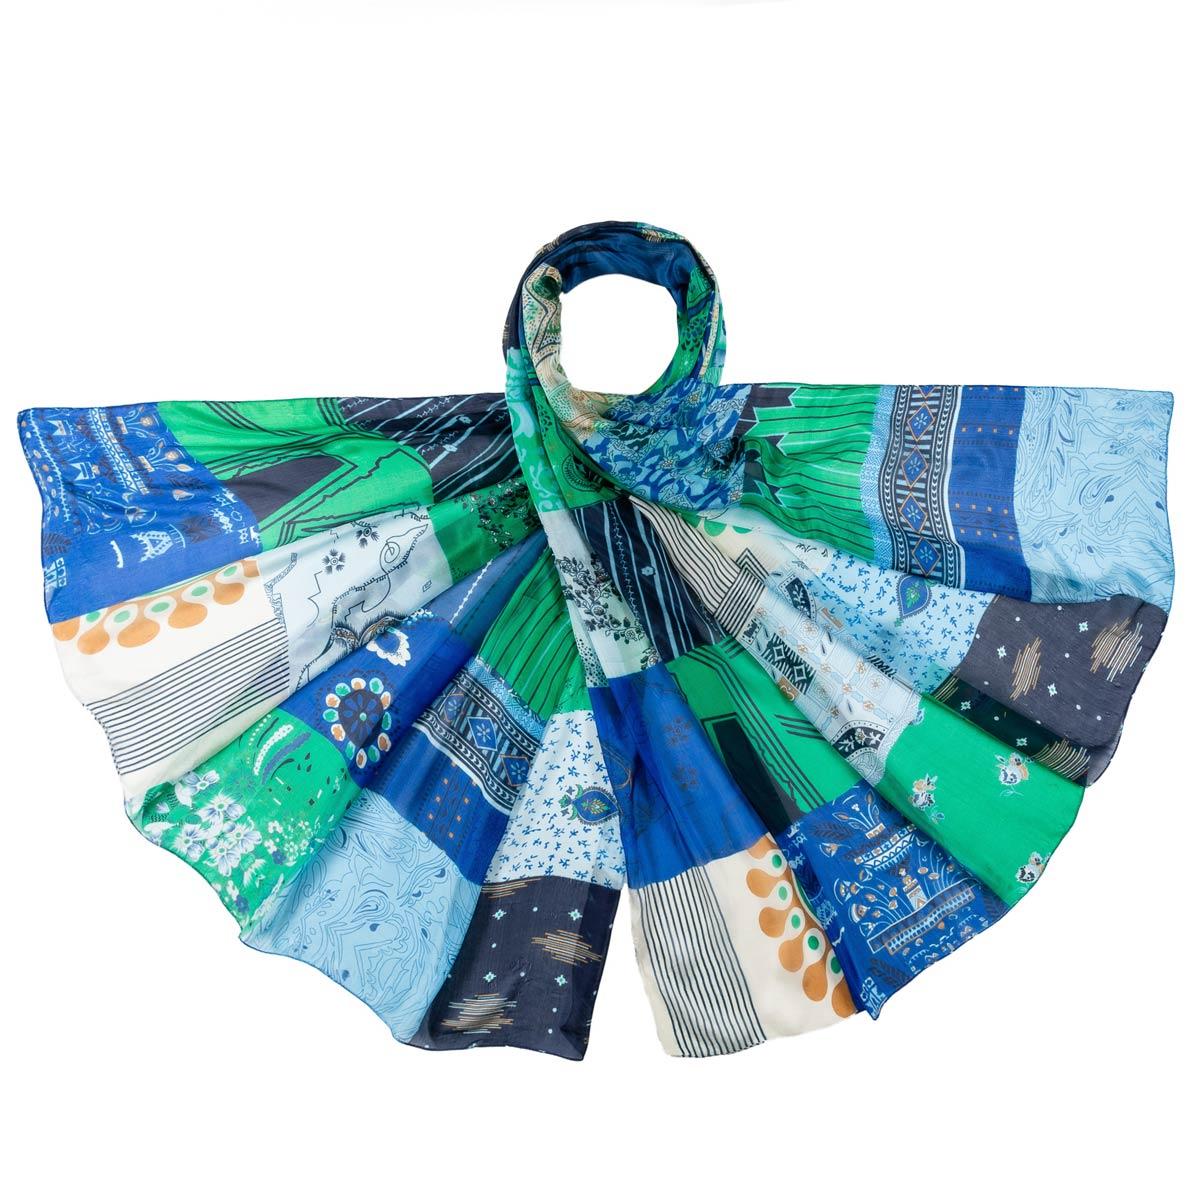 AT-06351-F12-etole-soie-fine-bleue-patchwork